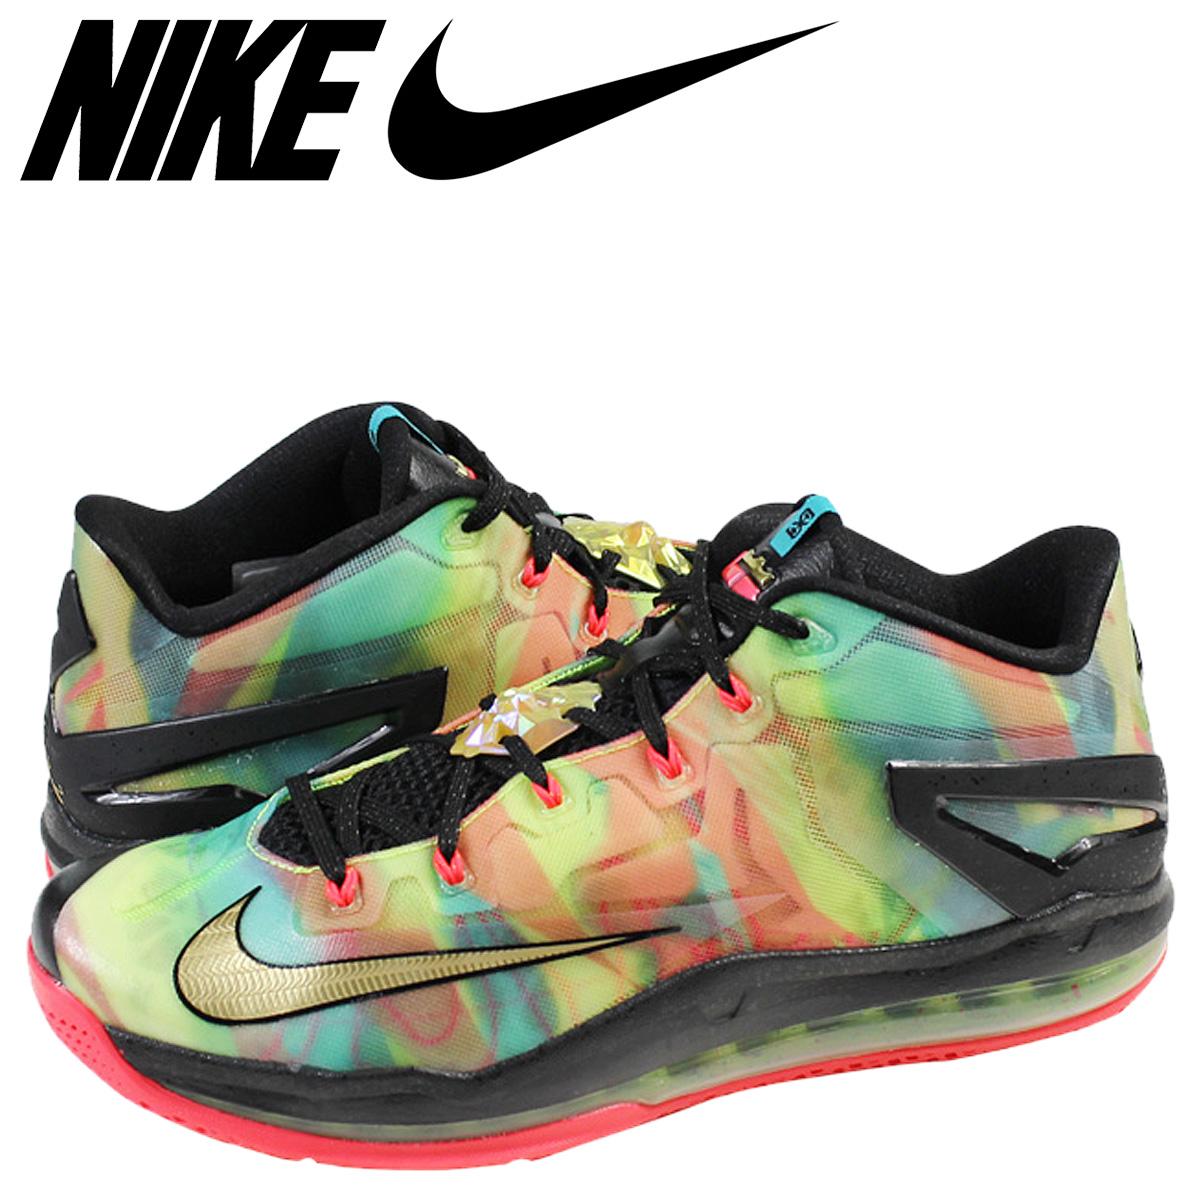 official photos 4fe33 78f2c Nike NIKE LeBron sneakers LEBRON 11 LOW SE CHANPIONSHIP PACK LeBron 11 Lo SE  Championship 695224-970 men s multi